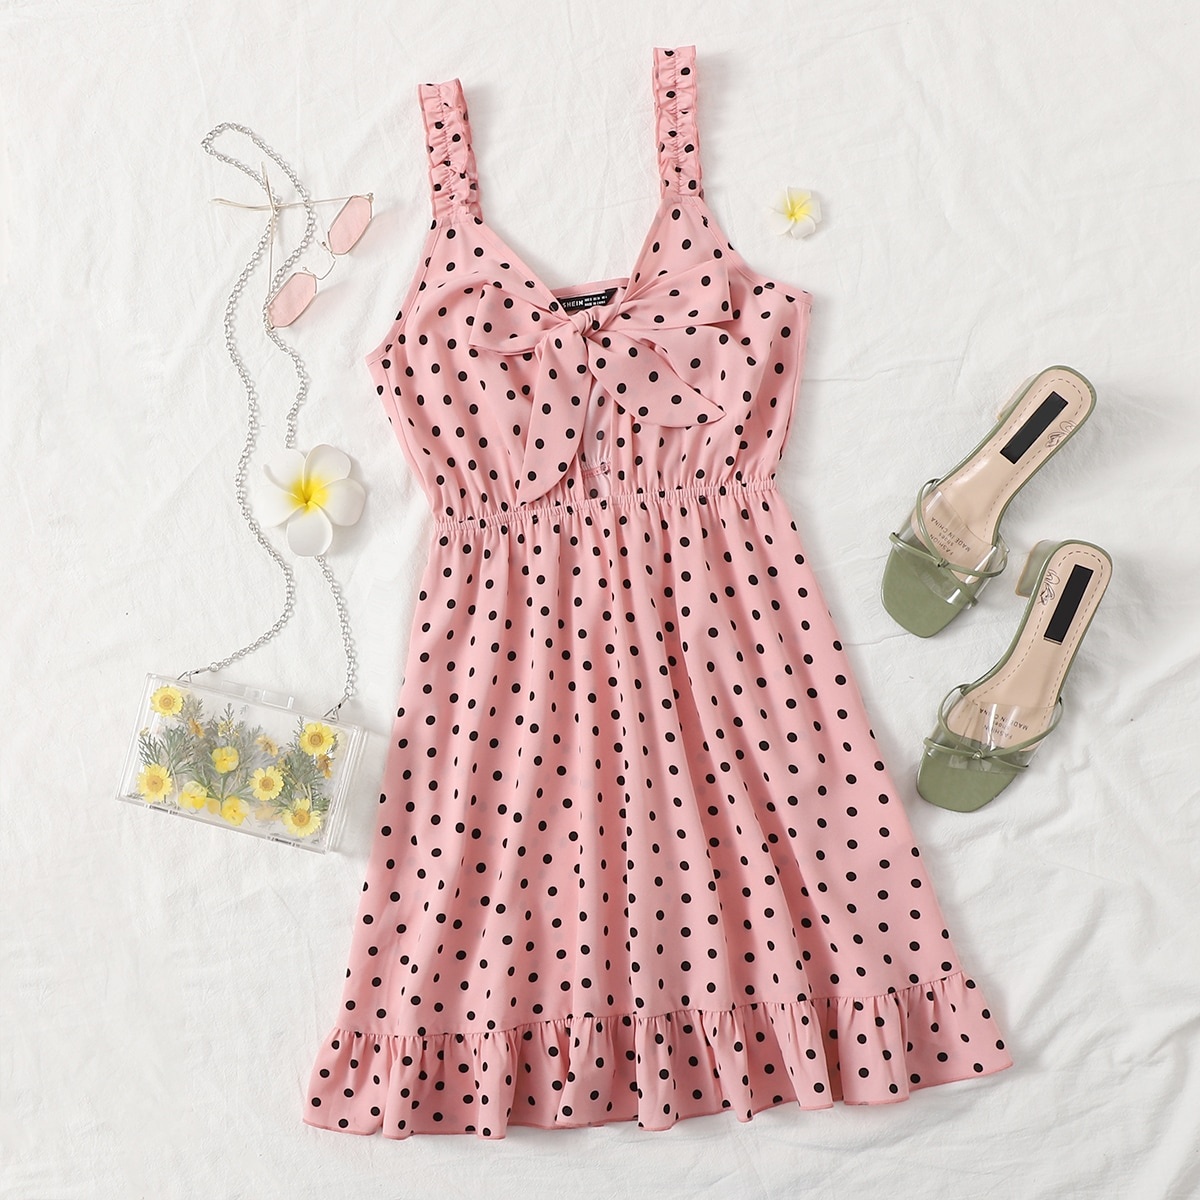 Polka Dot Tie Front Ruffle Hem Cami Dress, SHEIN  - buy with discount